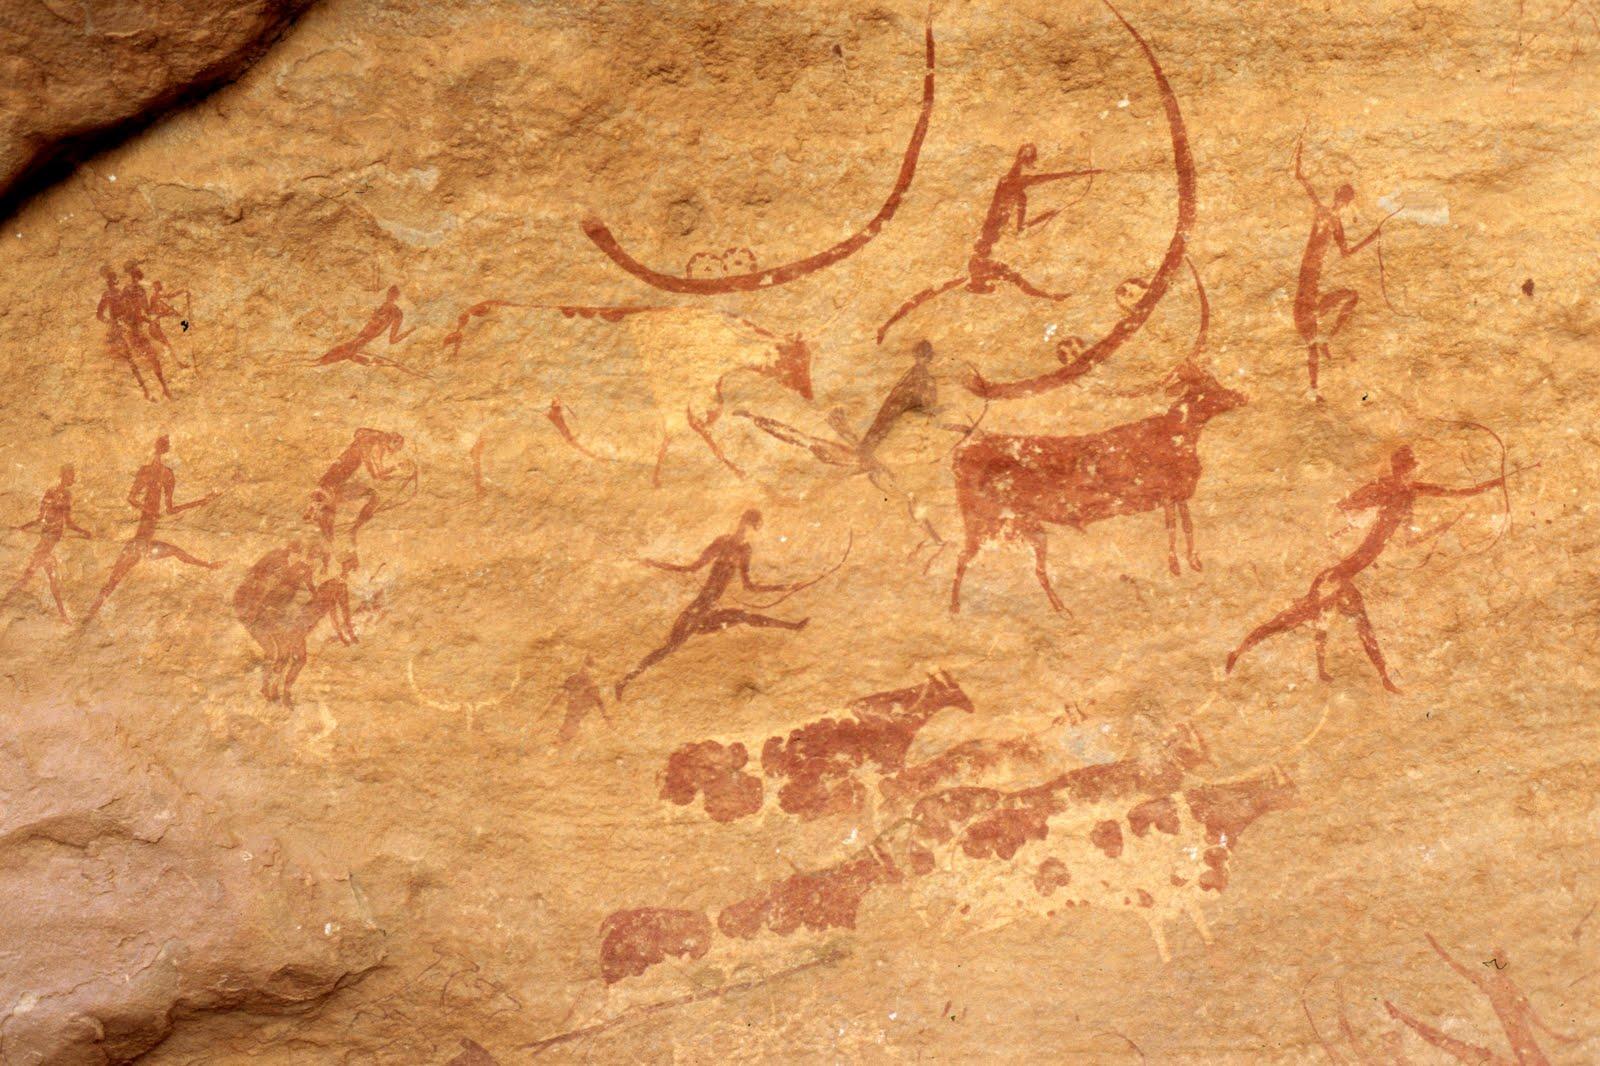 Рисунки на плато тассилин адджер